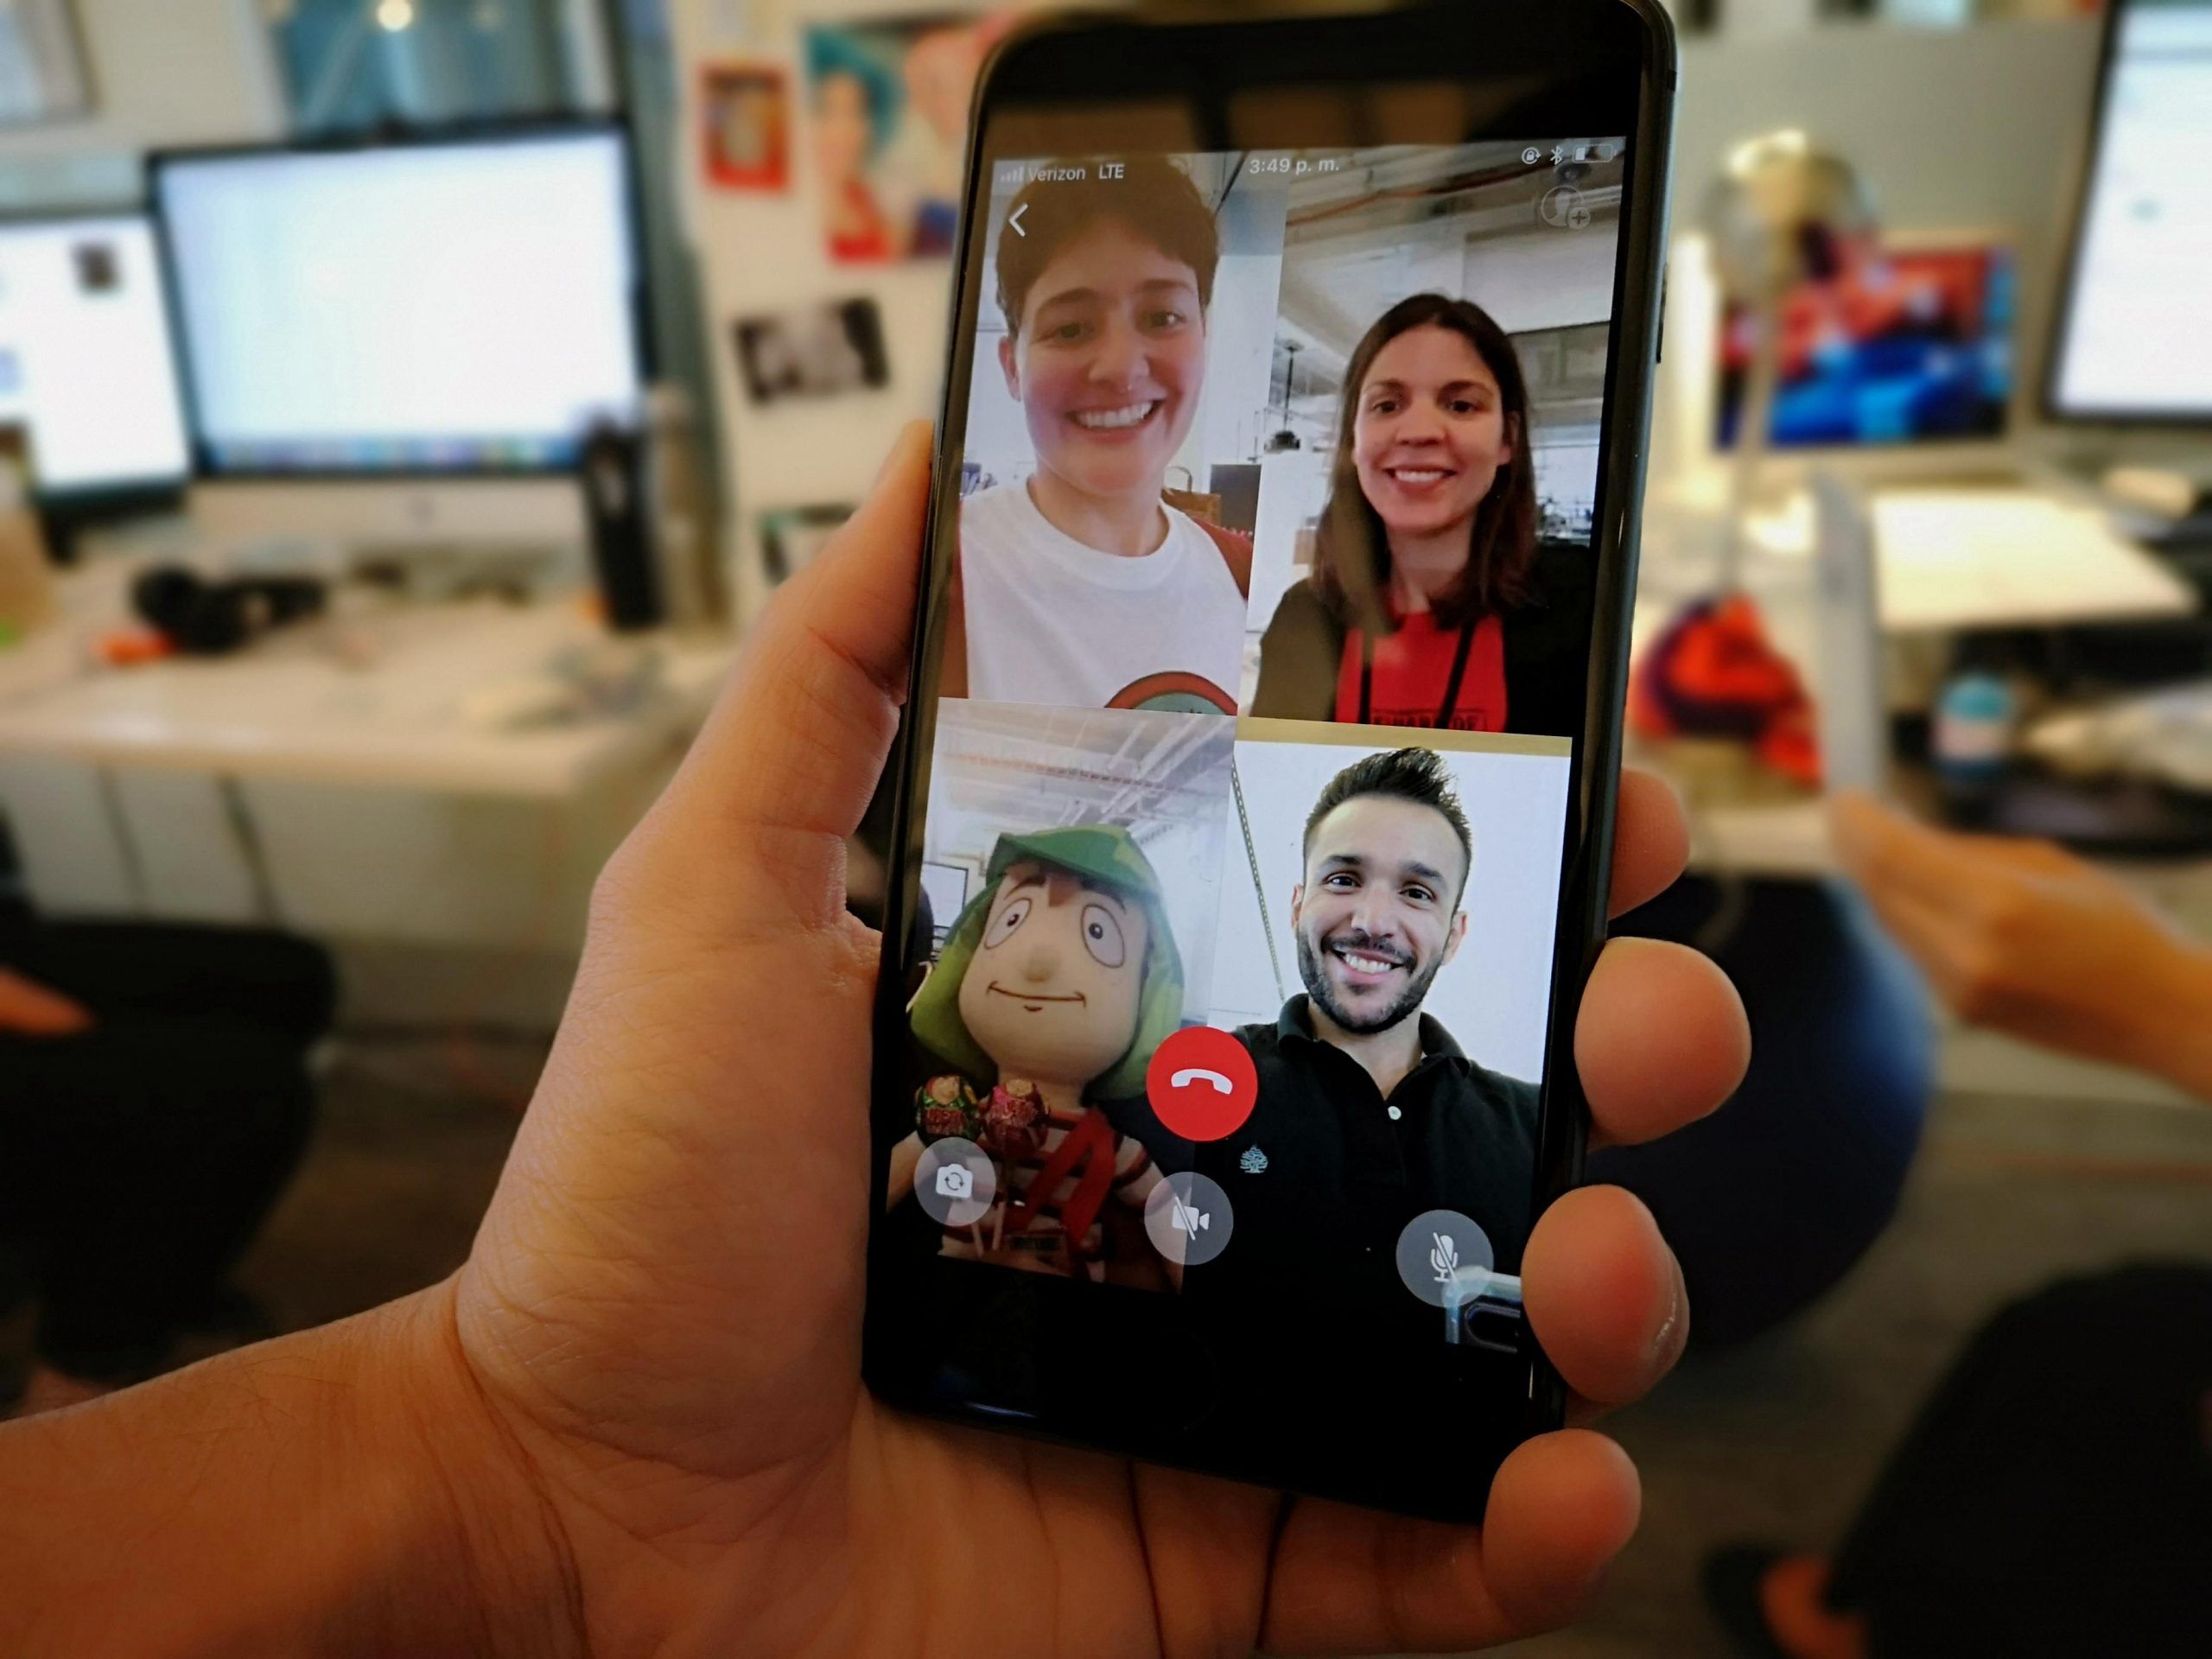 Whatsapp aumentó las videollamadas a 8 participantes